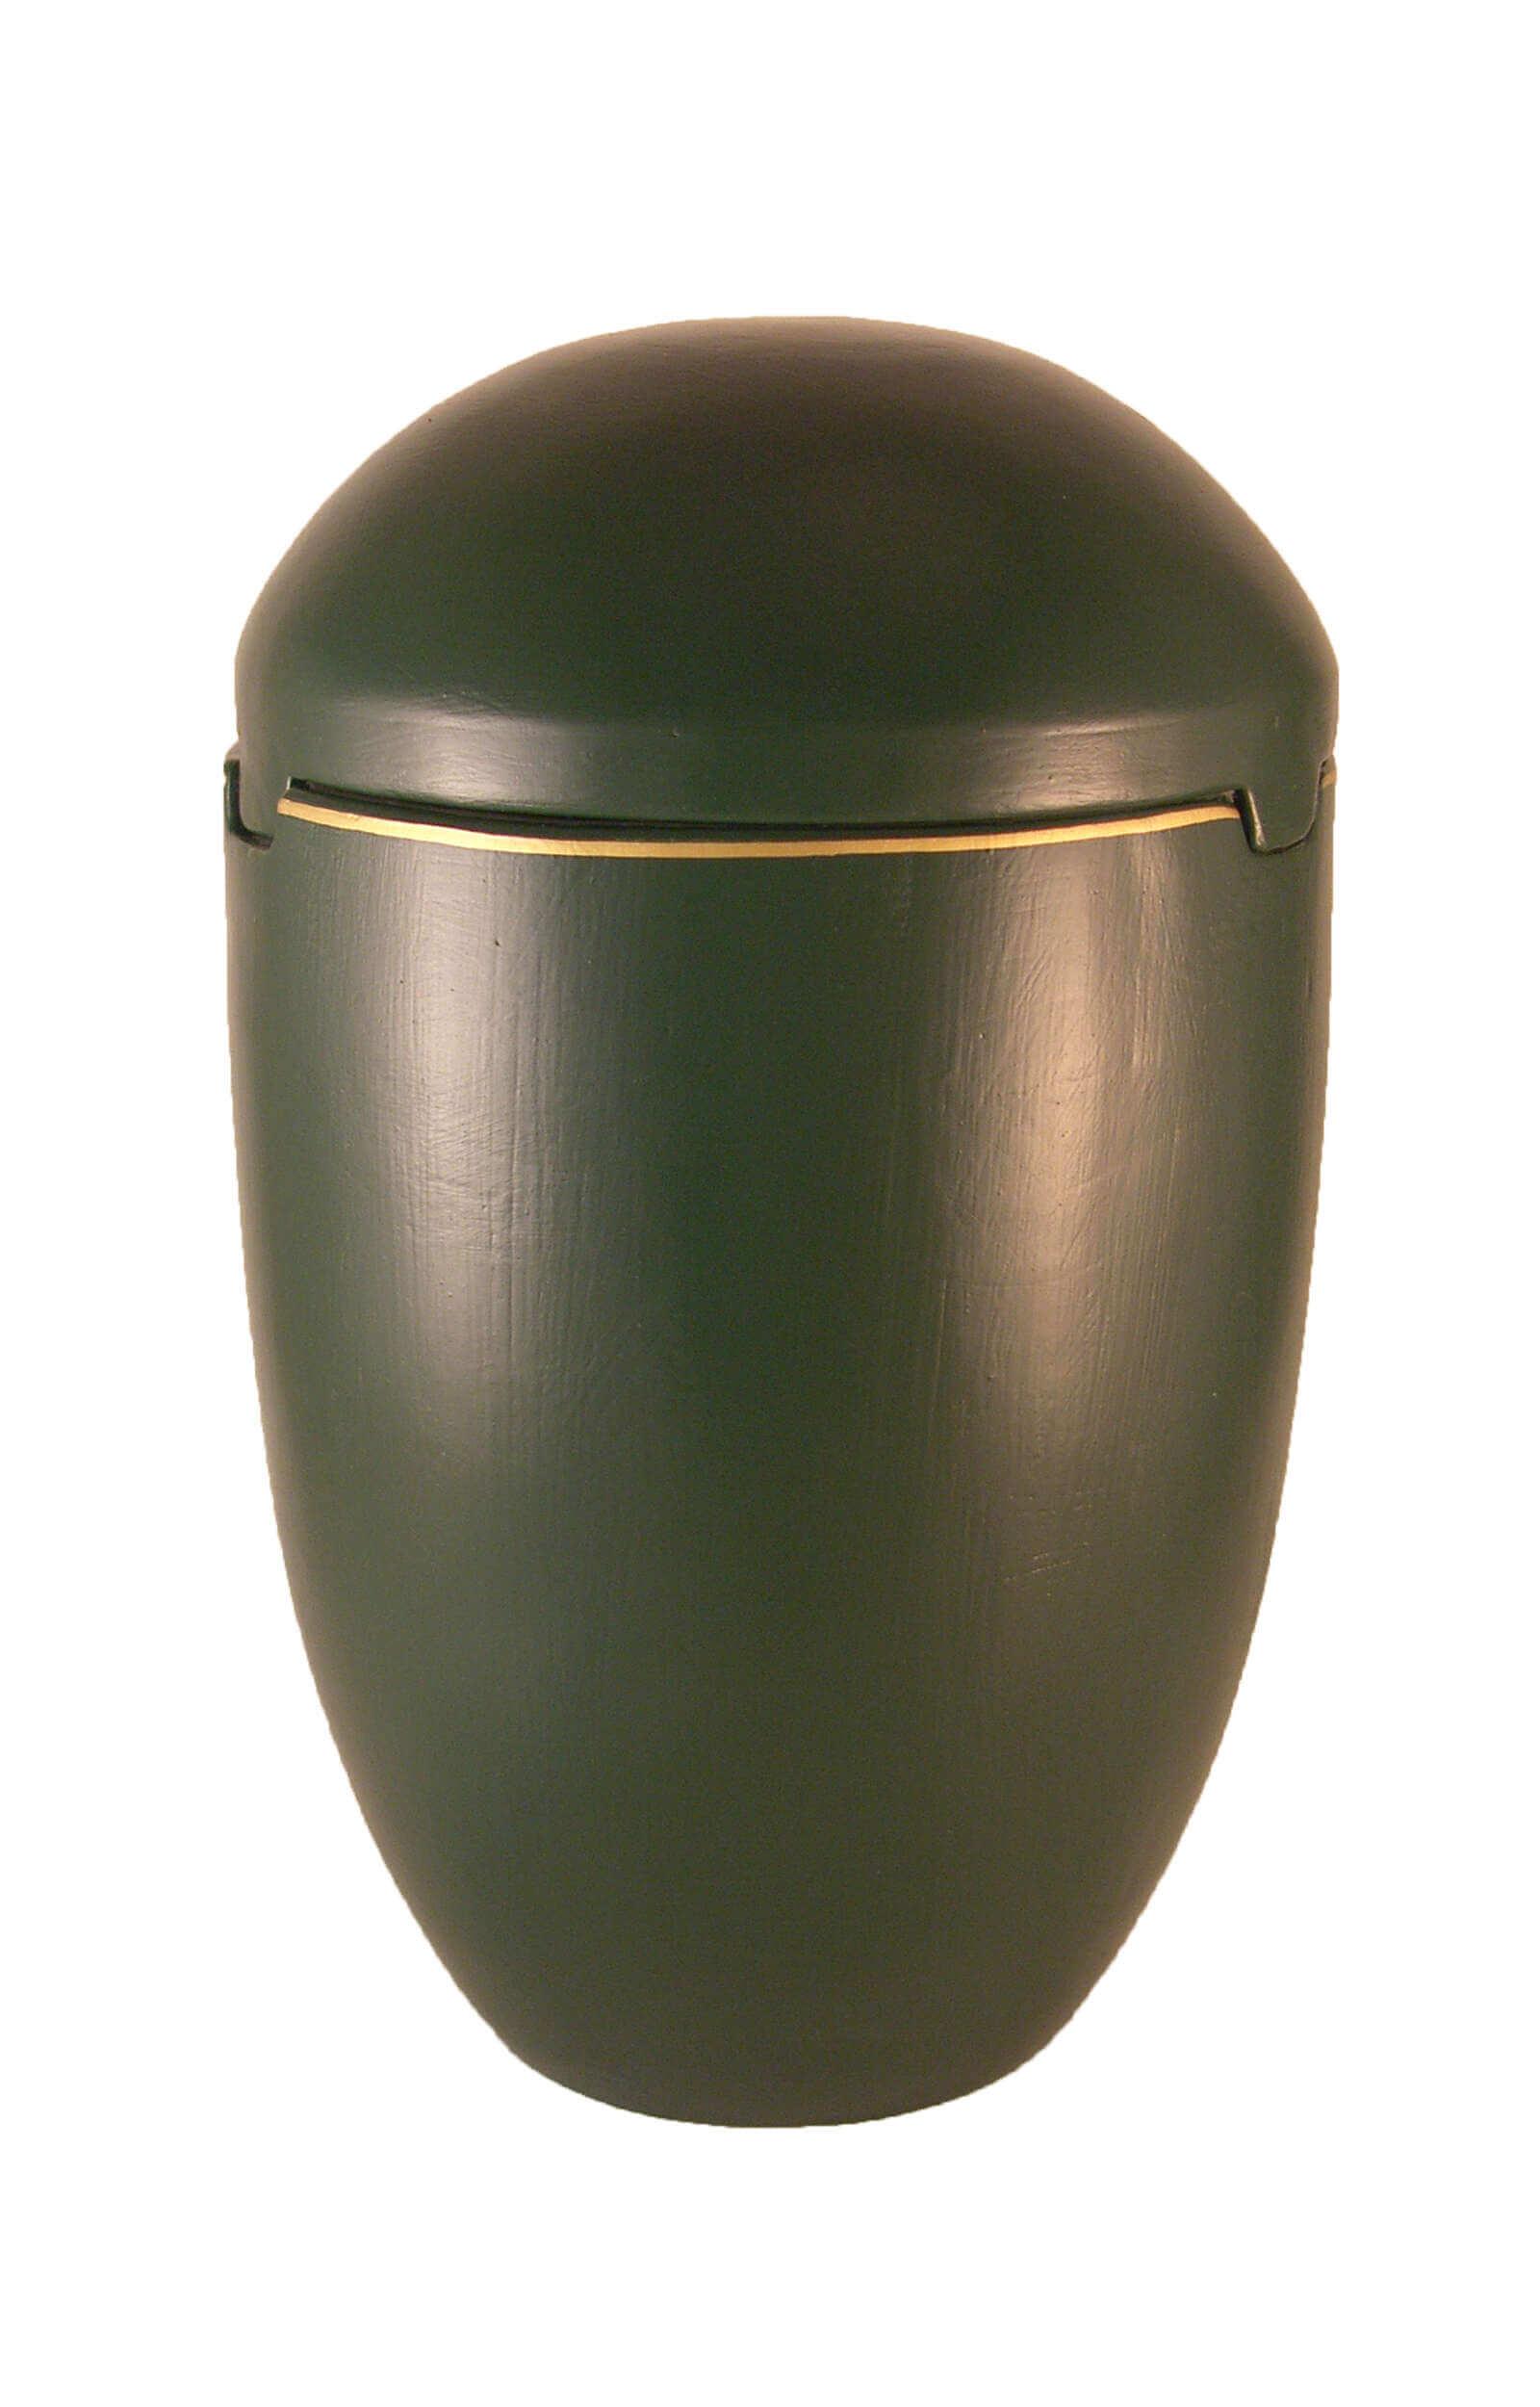 en SK7021 sea urn green funeral urns for human ashes on sale